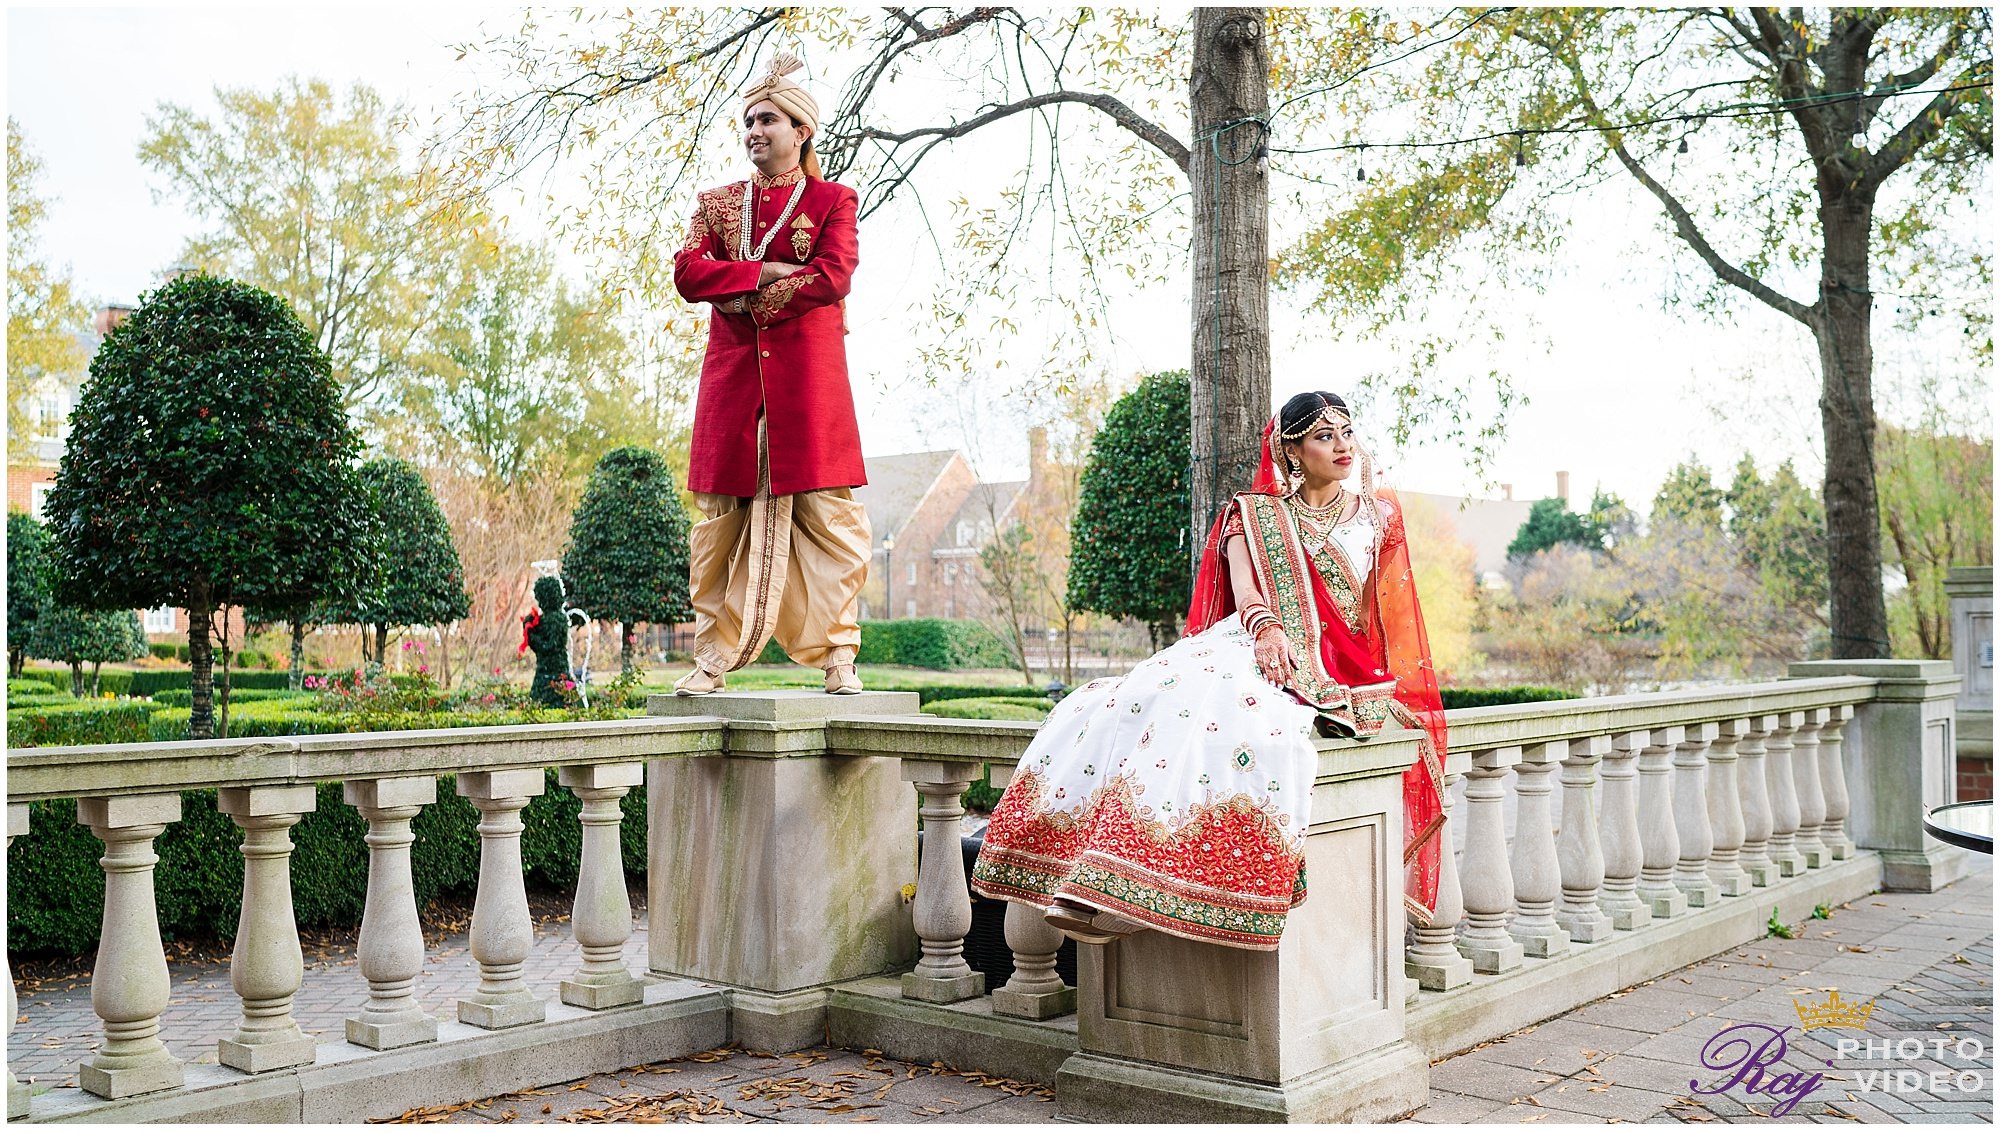 Founders-Inn-and-Spa-Virginia-Beach-VA-Indian-Wedding-Harini-Vivek-59.jpg